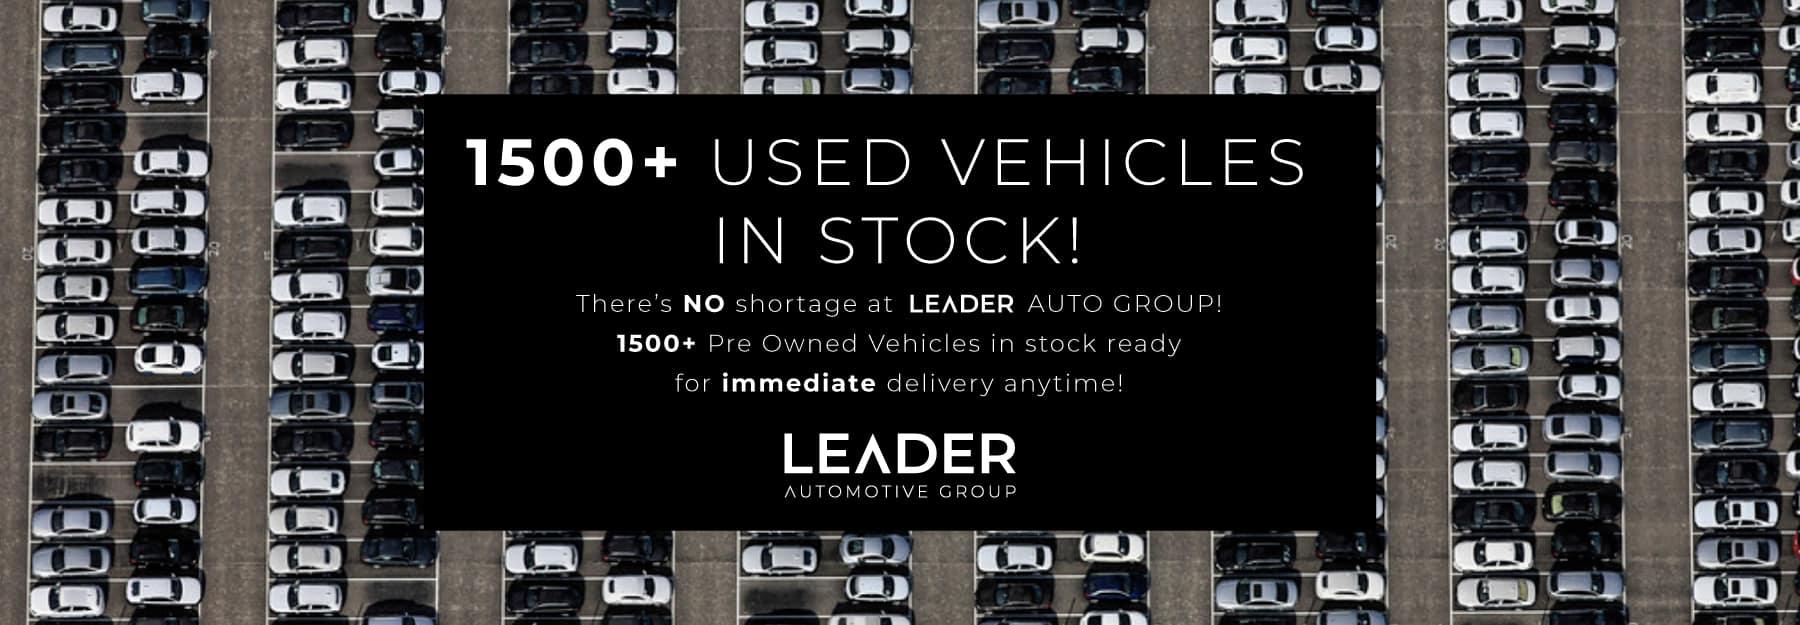 1500+Used-Banner-LEADER